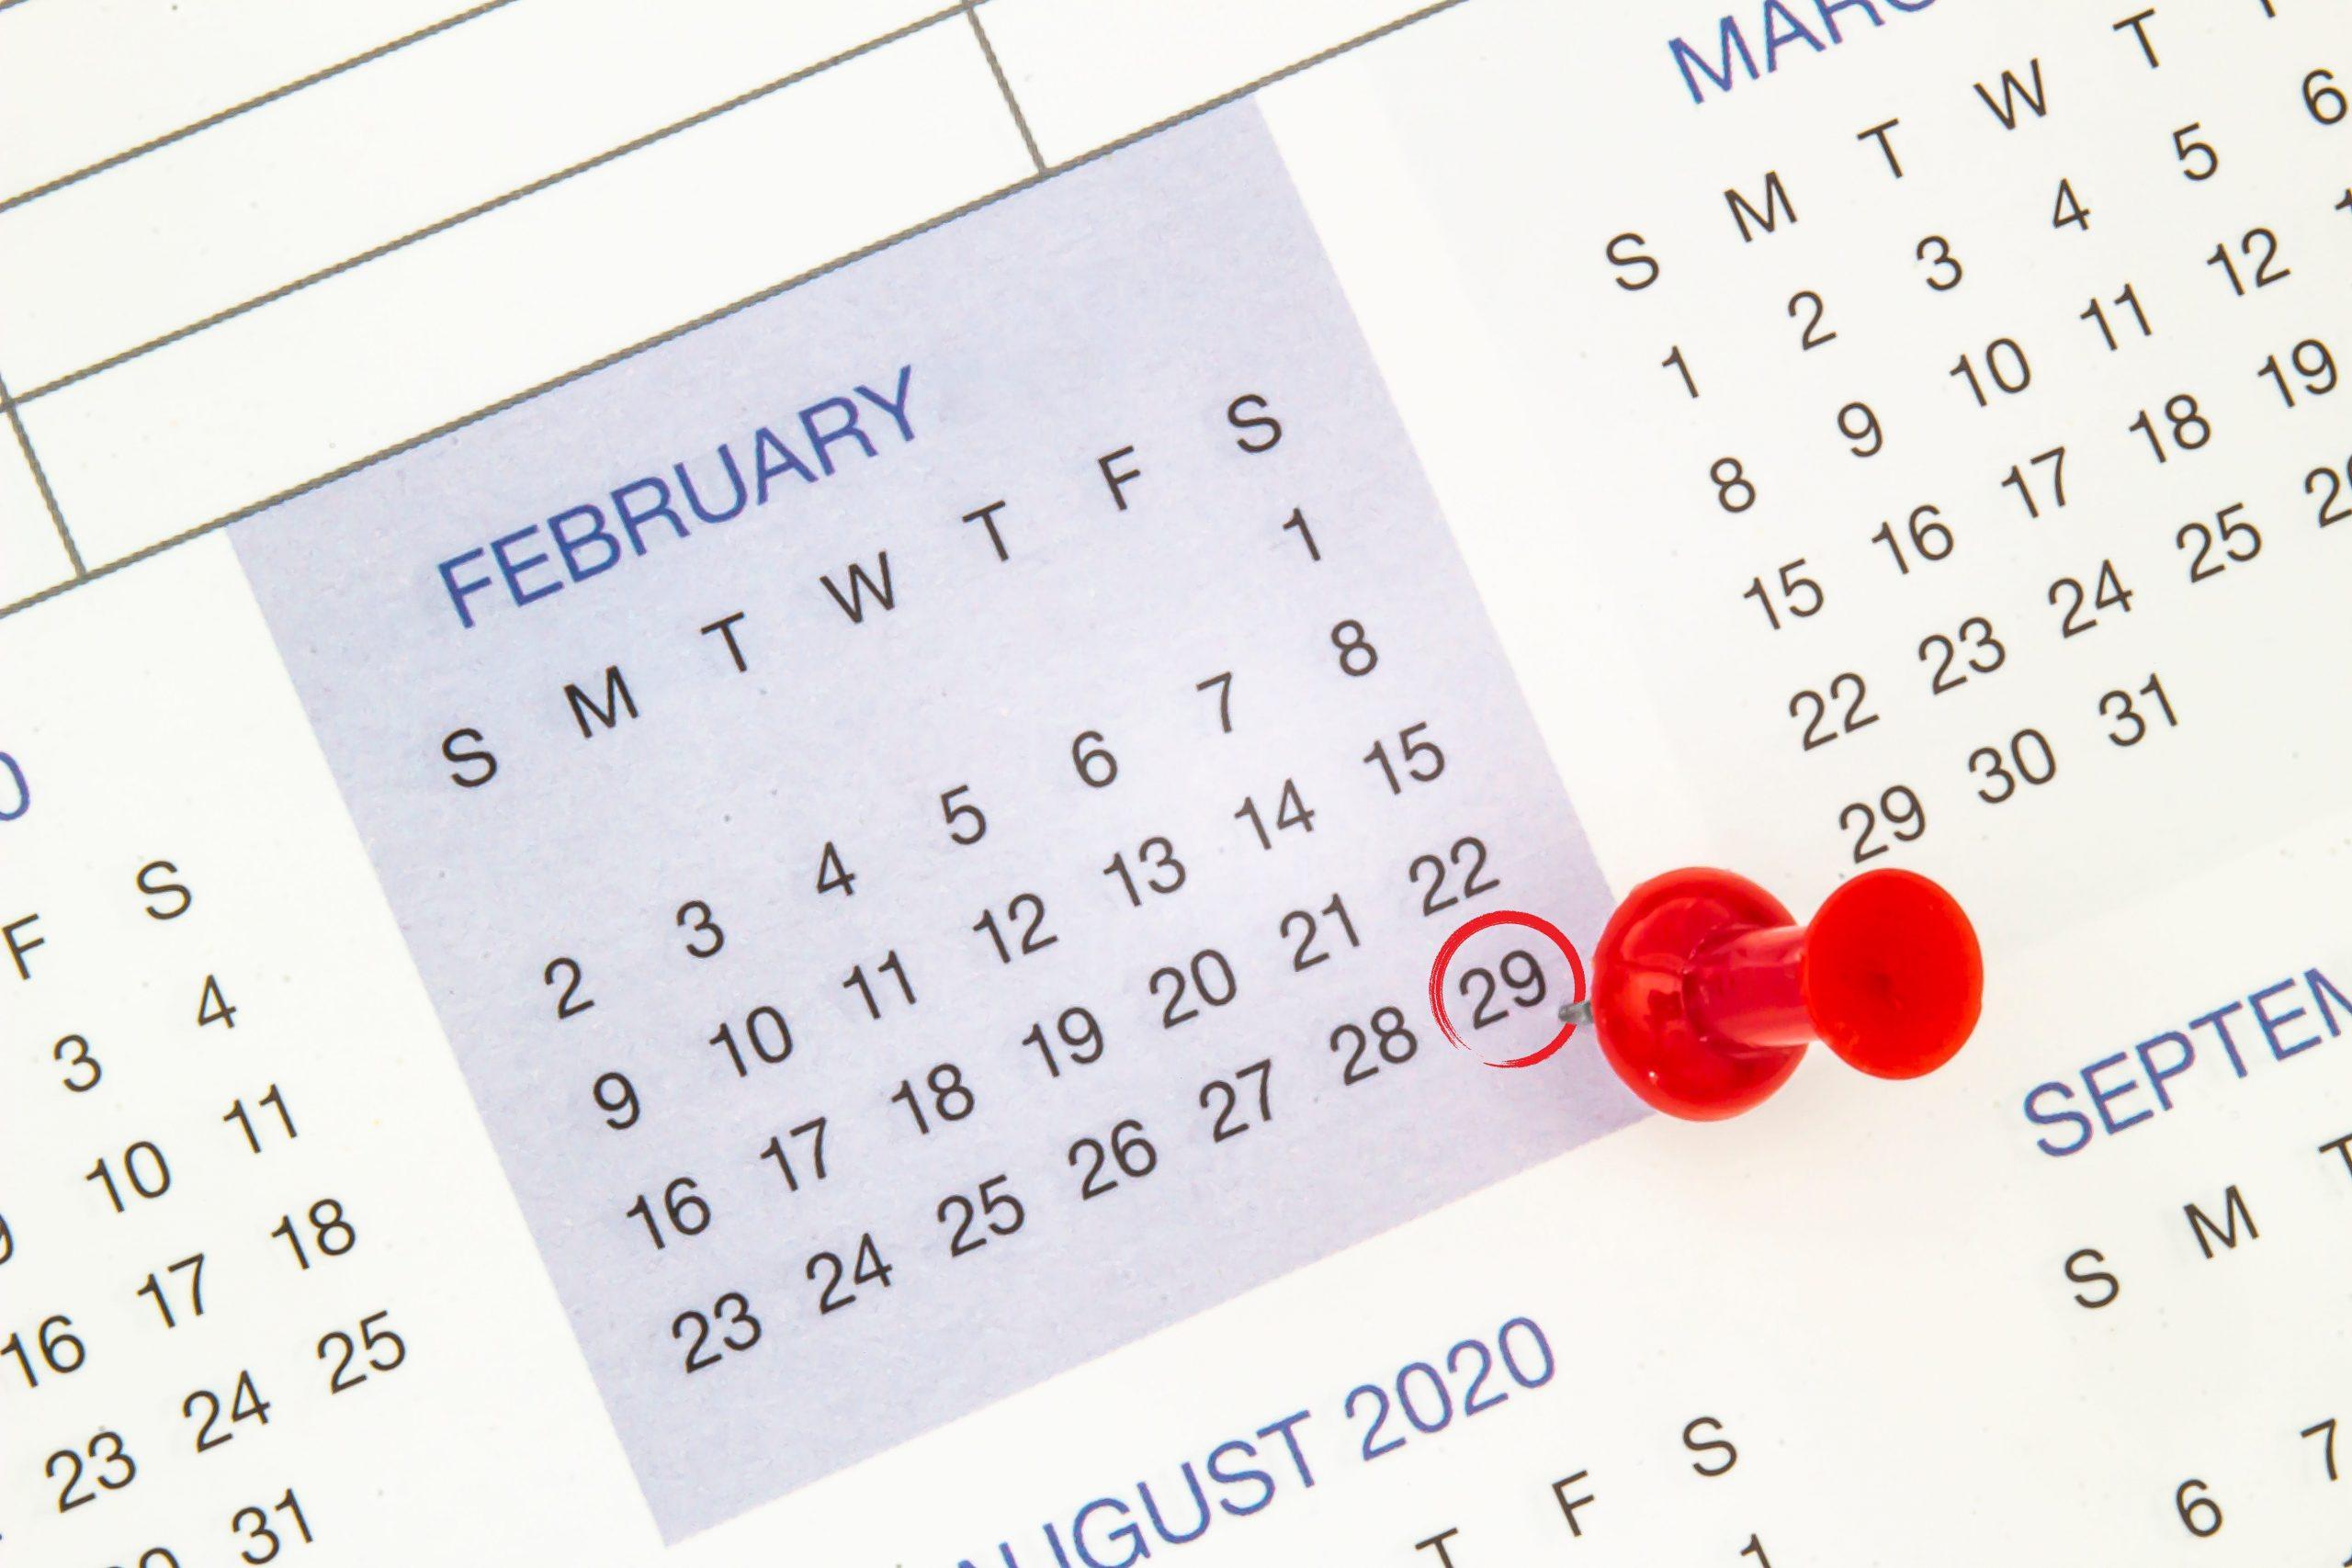 Depo Shot Schedule Leap Year 2021